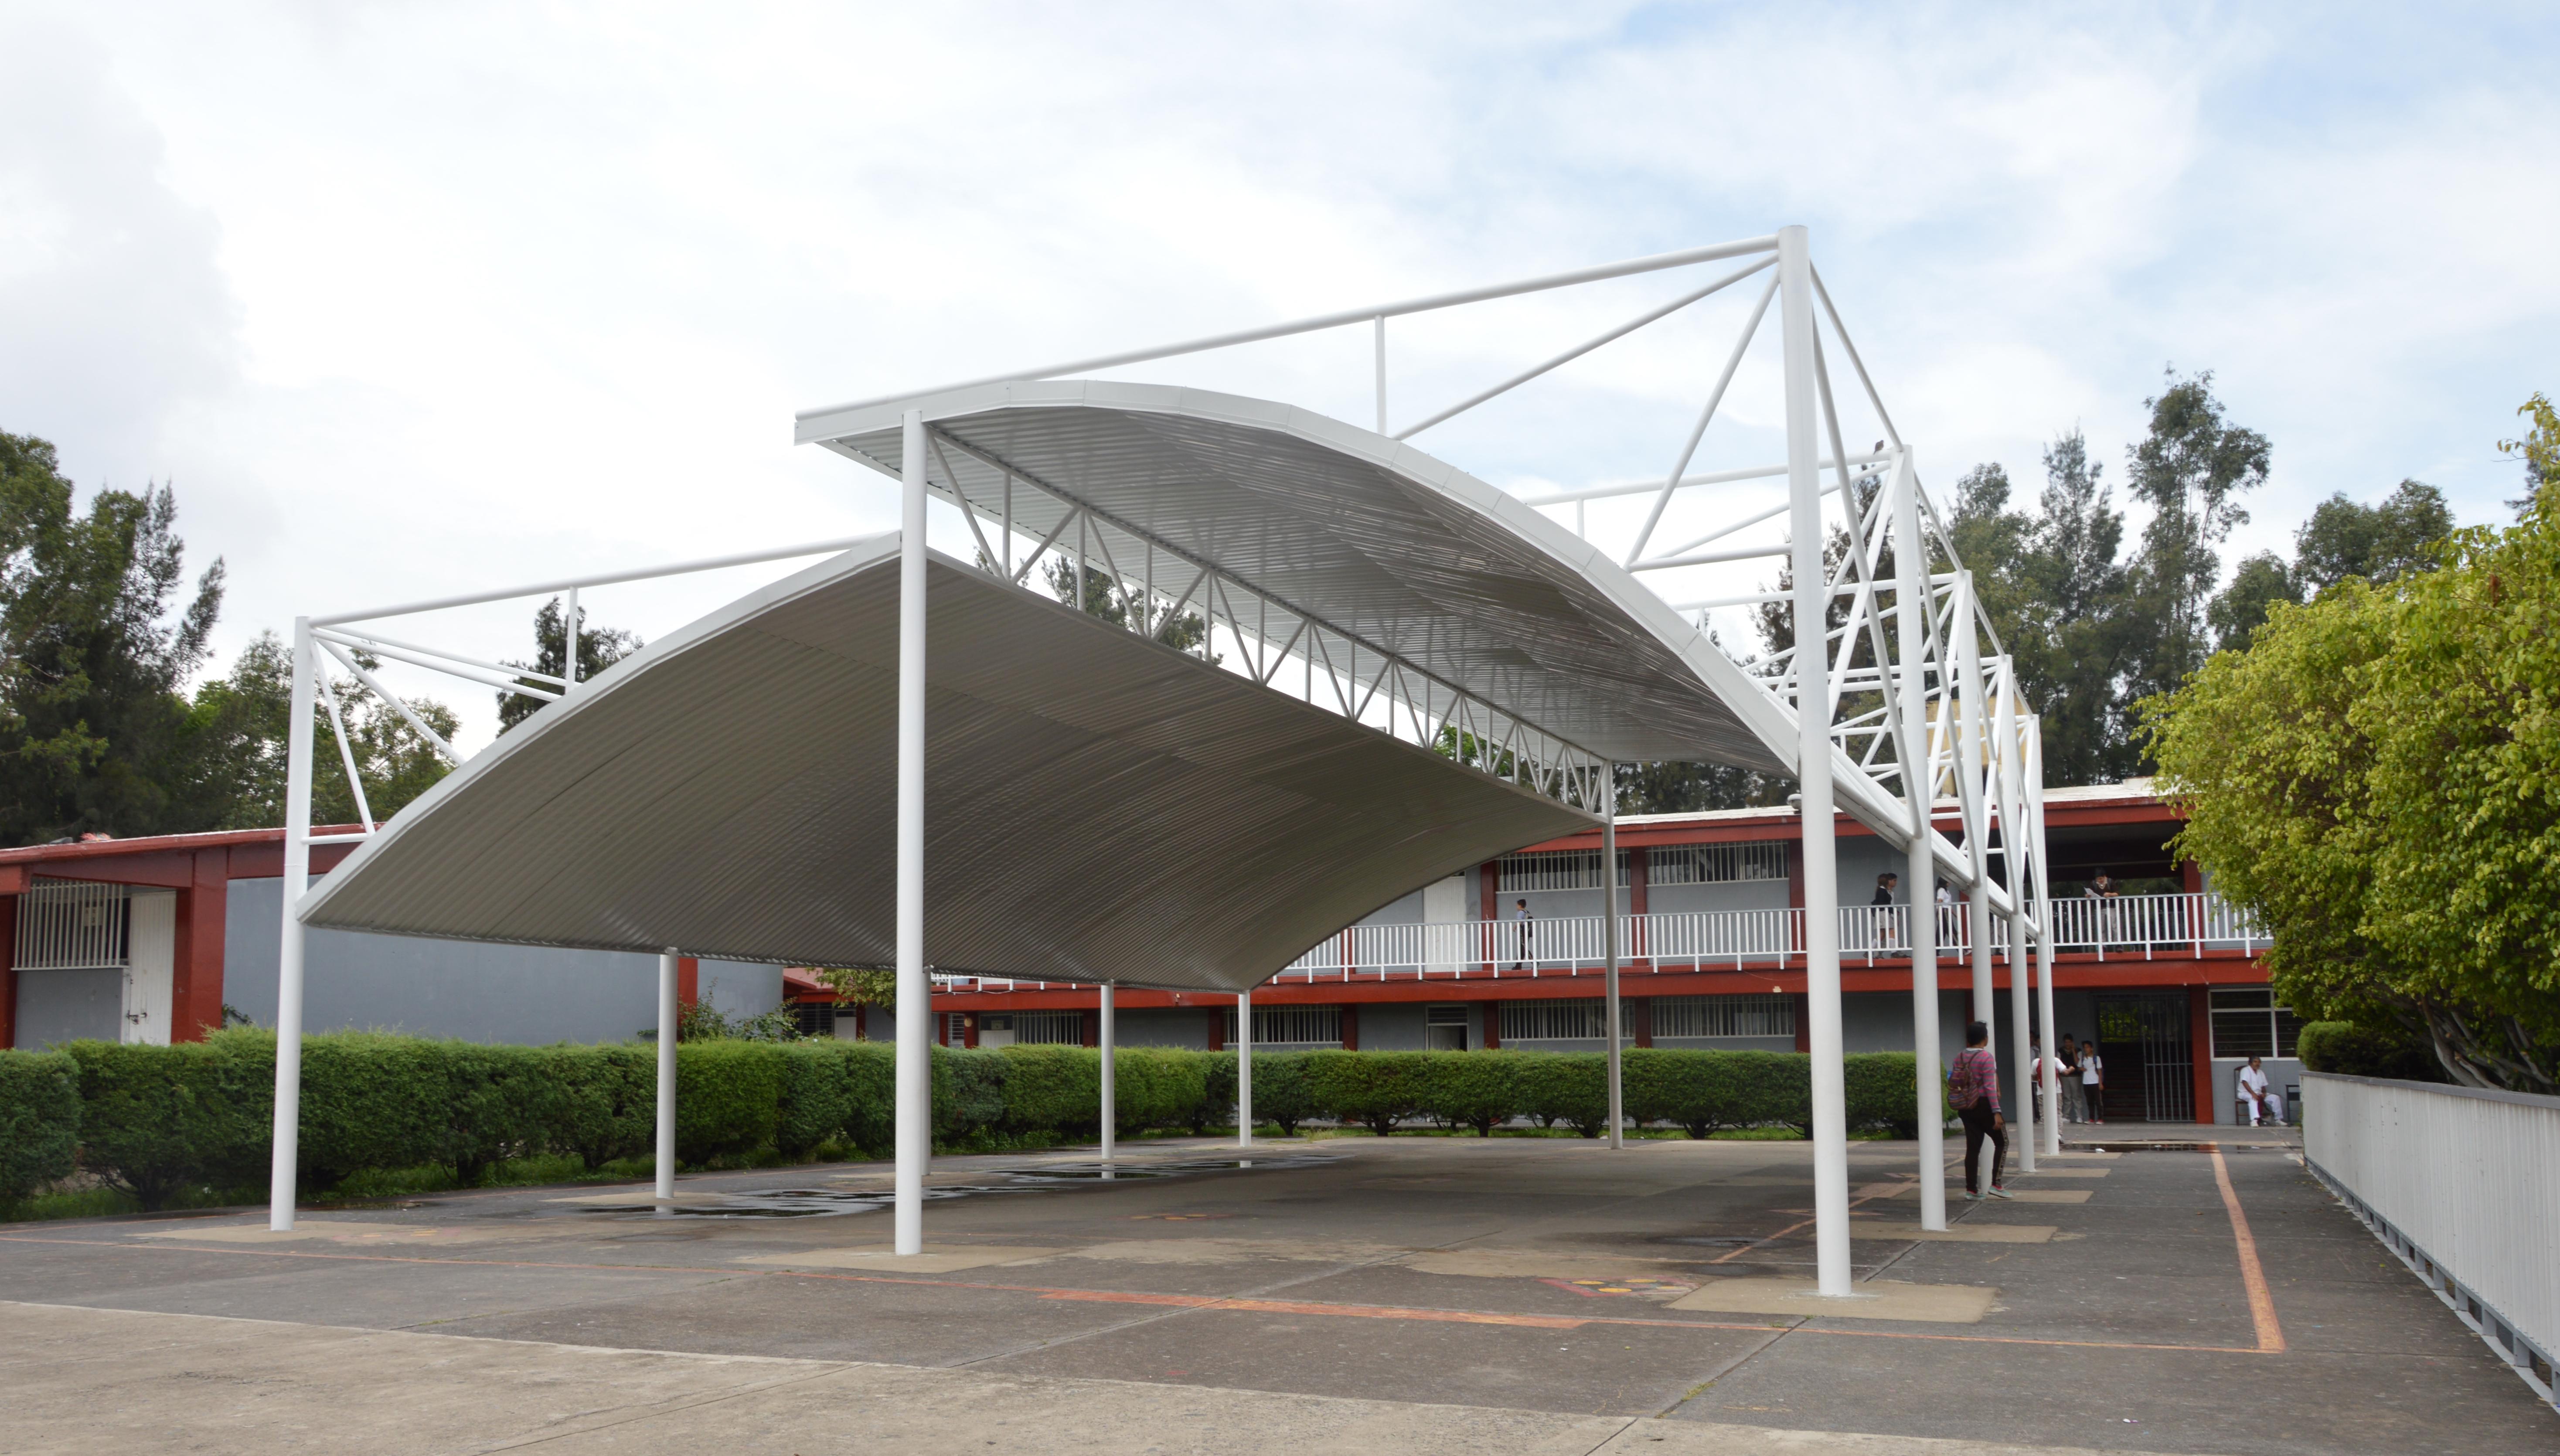 Instalan Malla Sombra En 28 Planteles Escolares Gobierno